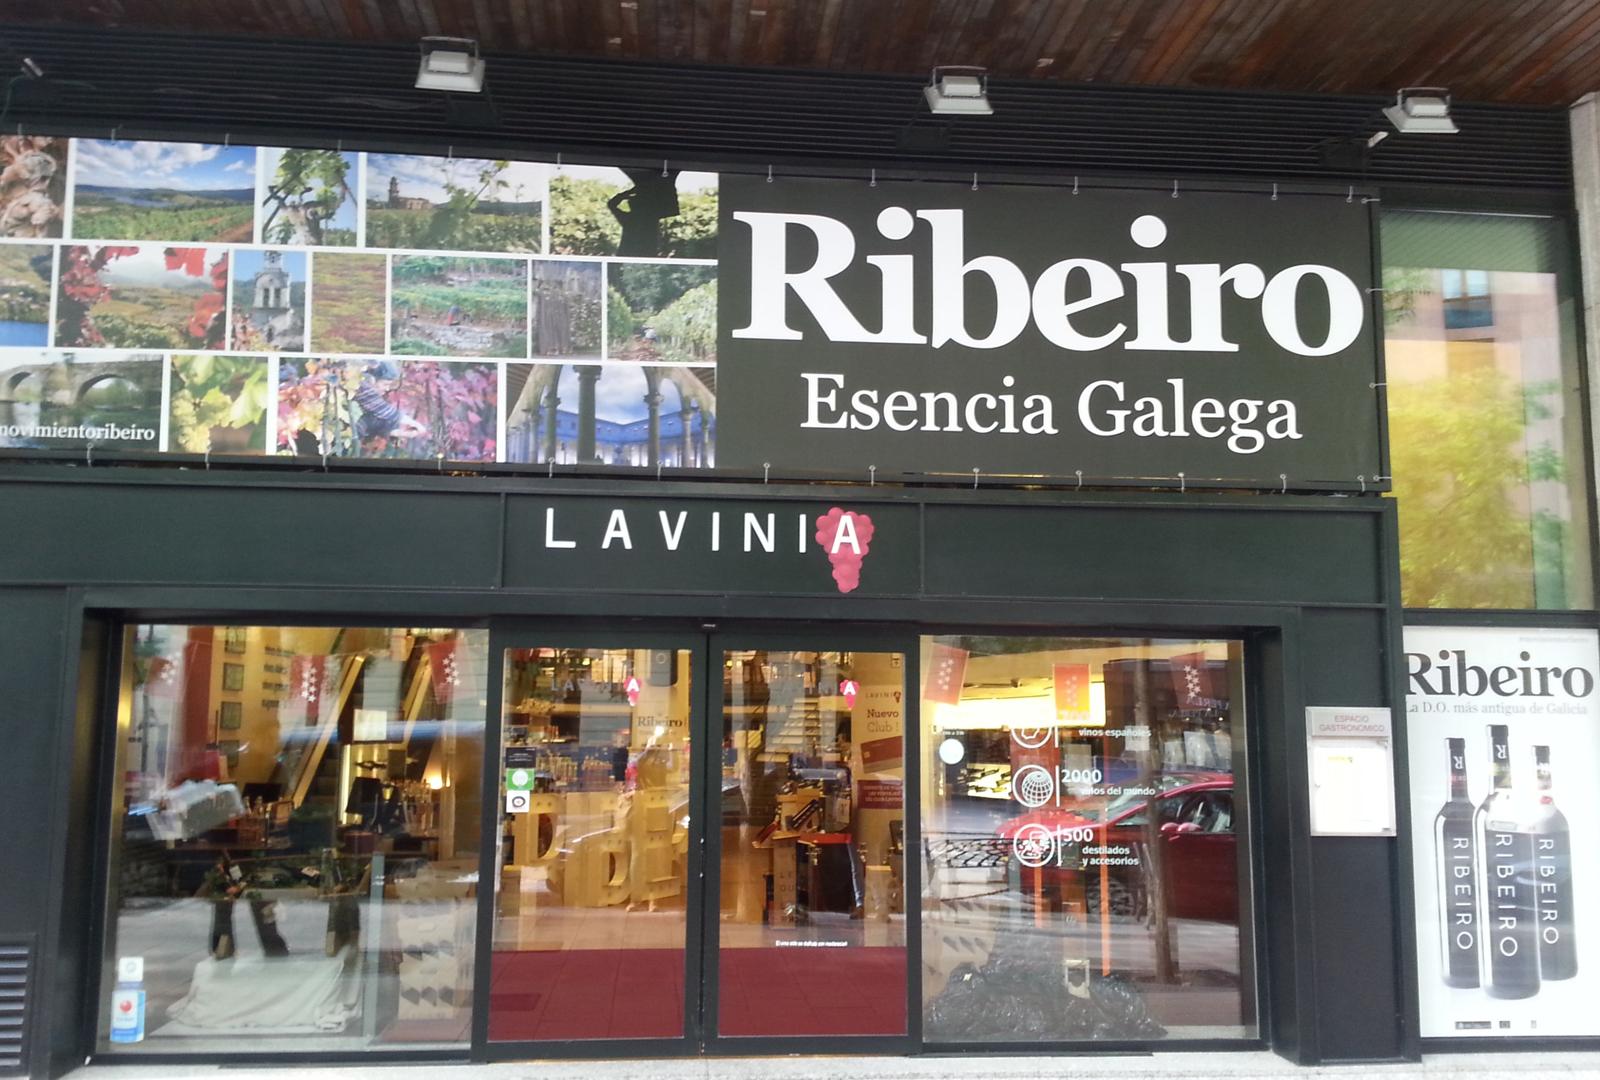 Lavinia Madrid, D.O. Ribeiro será la protagonista.